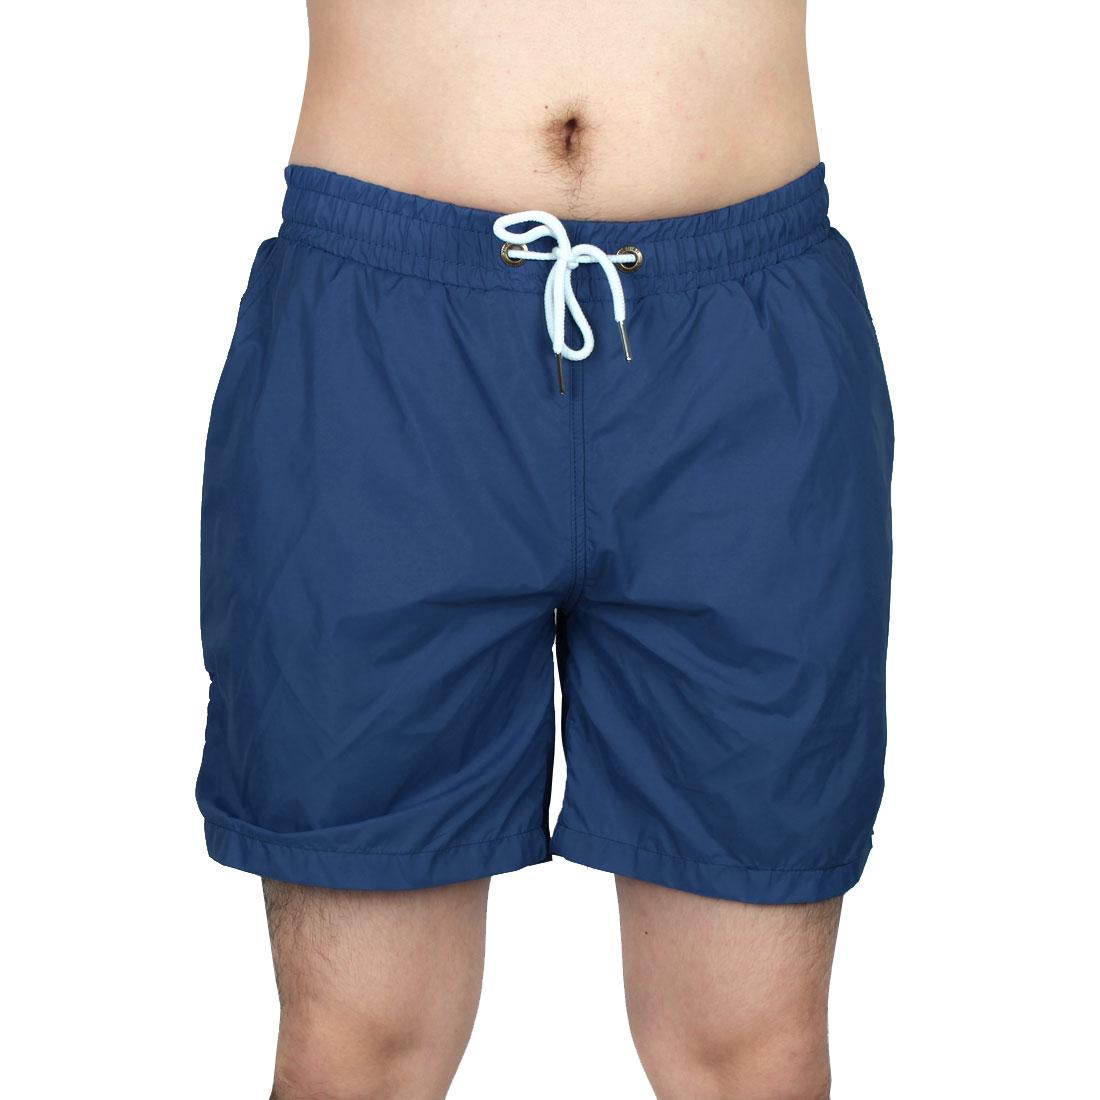 Men Exercise Running Summer Beach Surf Board Shorts Pants Teal Blue W30